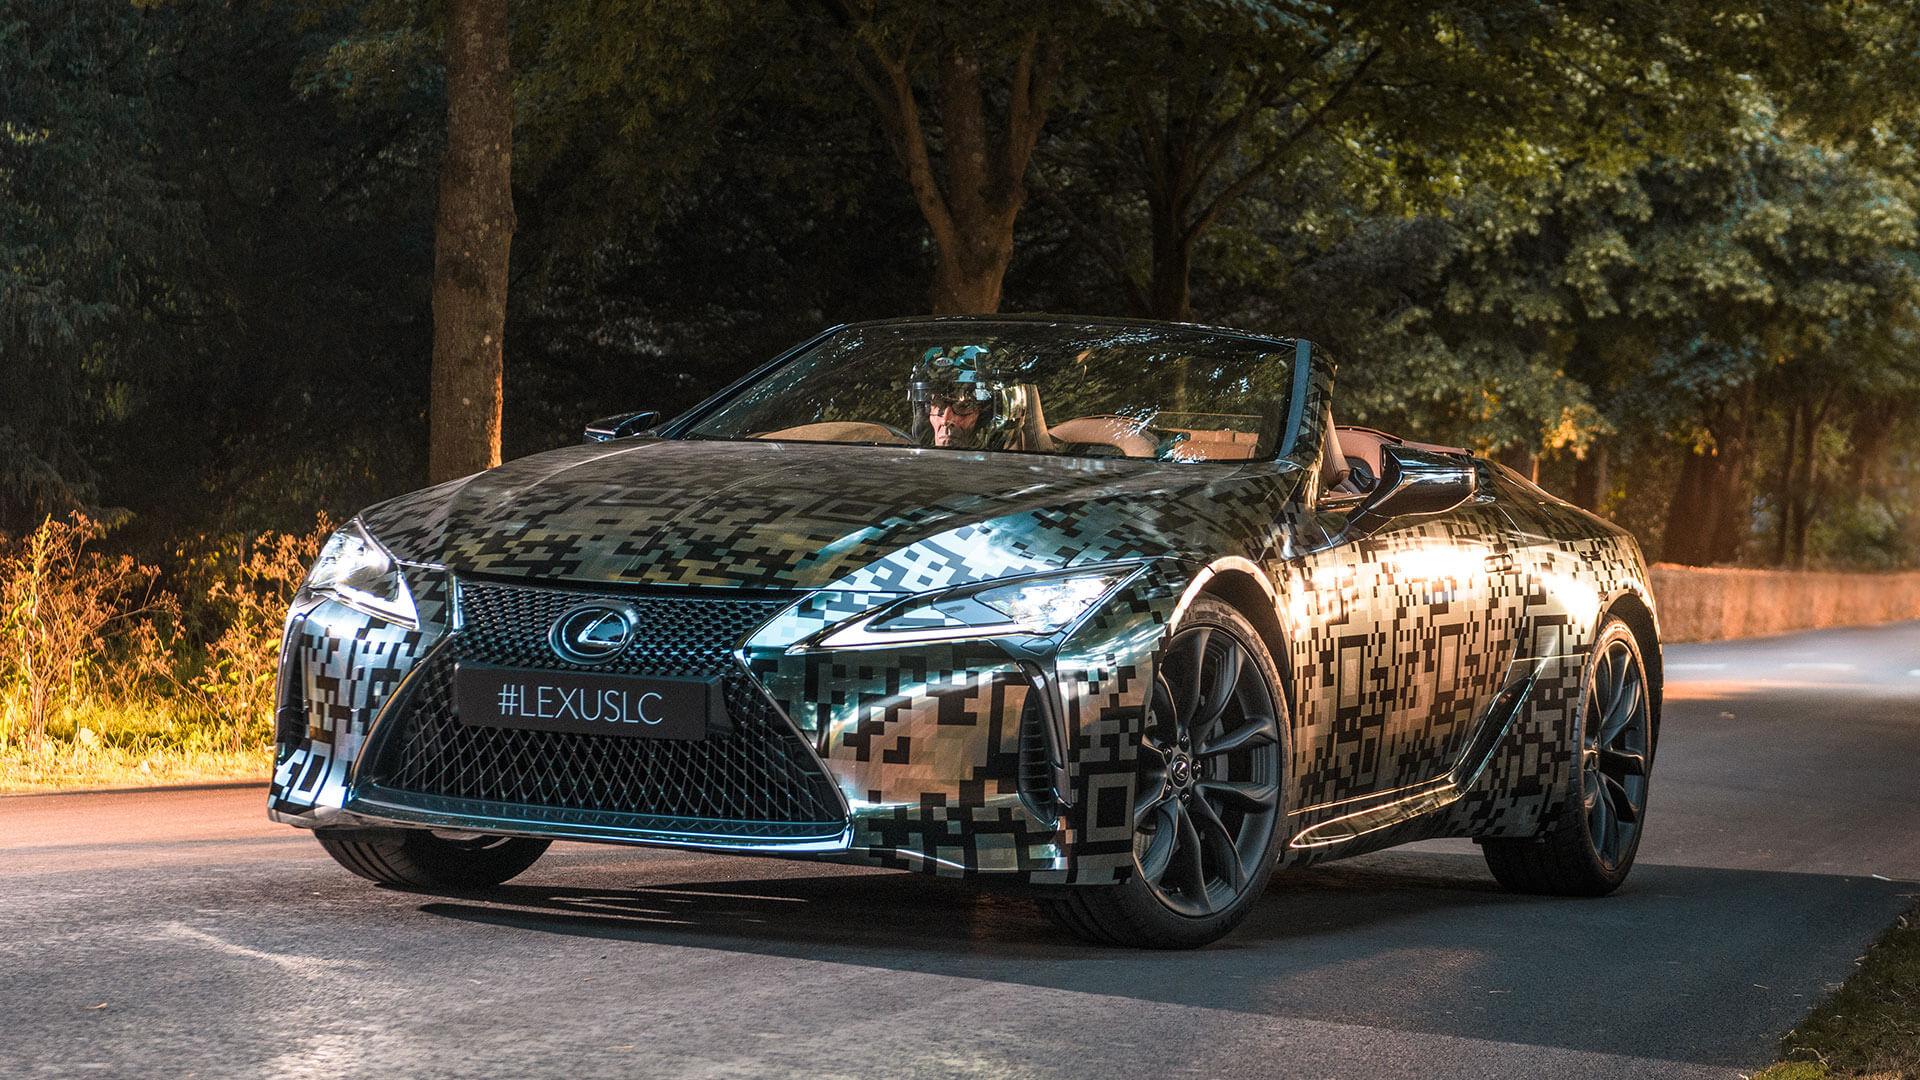 Lexus LC Convertible 04 Gallery Item Image